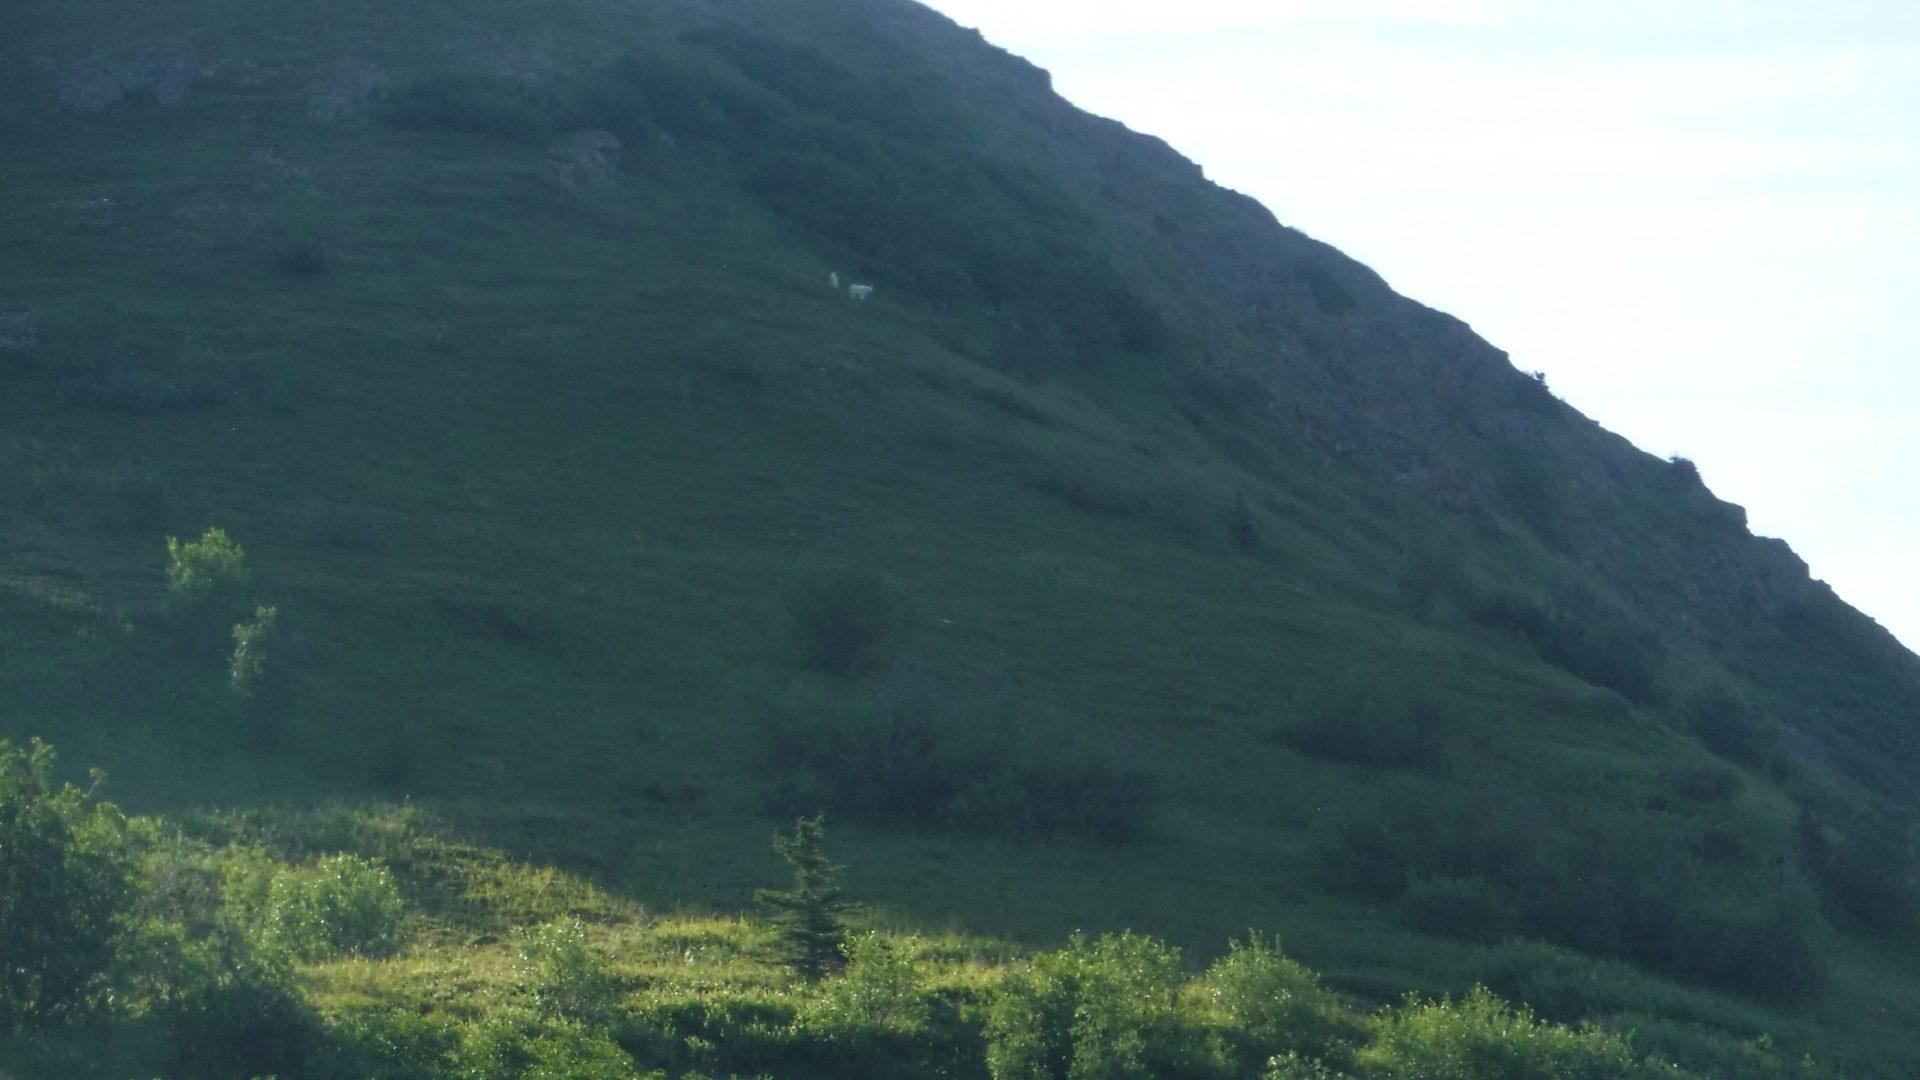 Mountain goats in the Chugach Mountains of Alaska